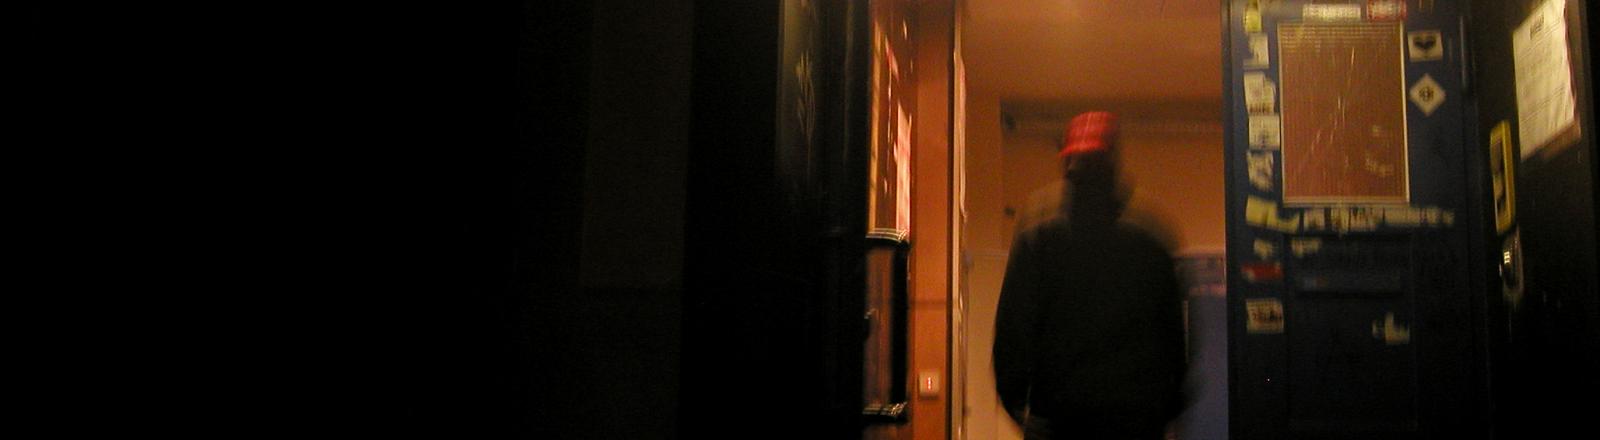 Mann steht in dunklem Türeingang.